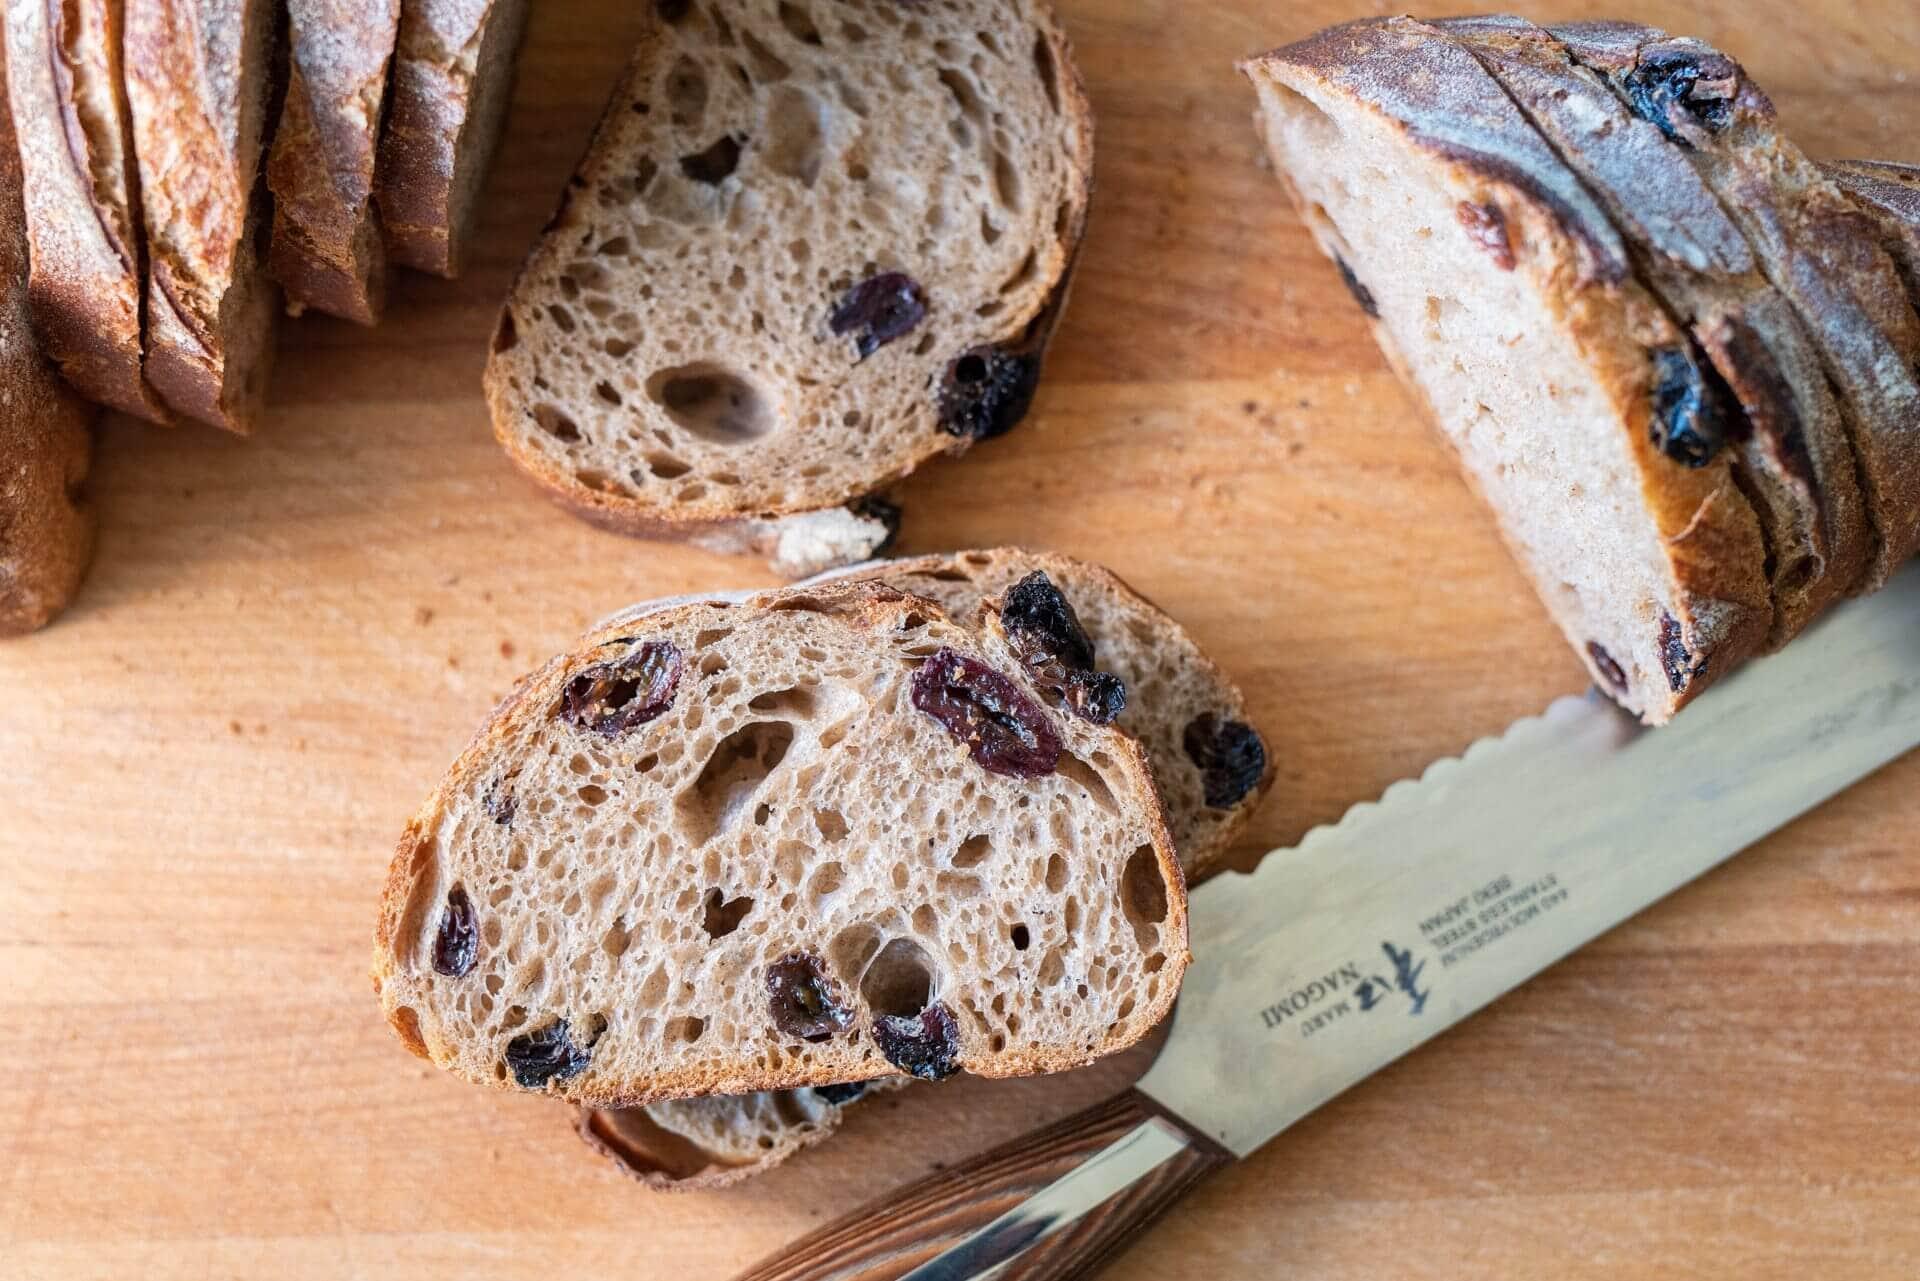 Cinnamon Raisin Sourdough crumb via @theperfectloaf